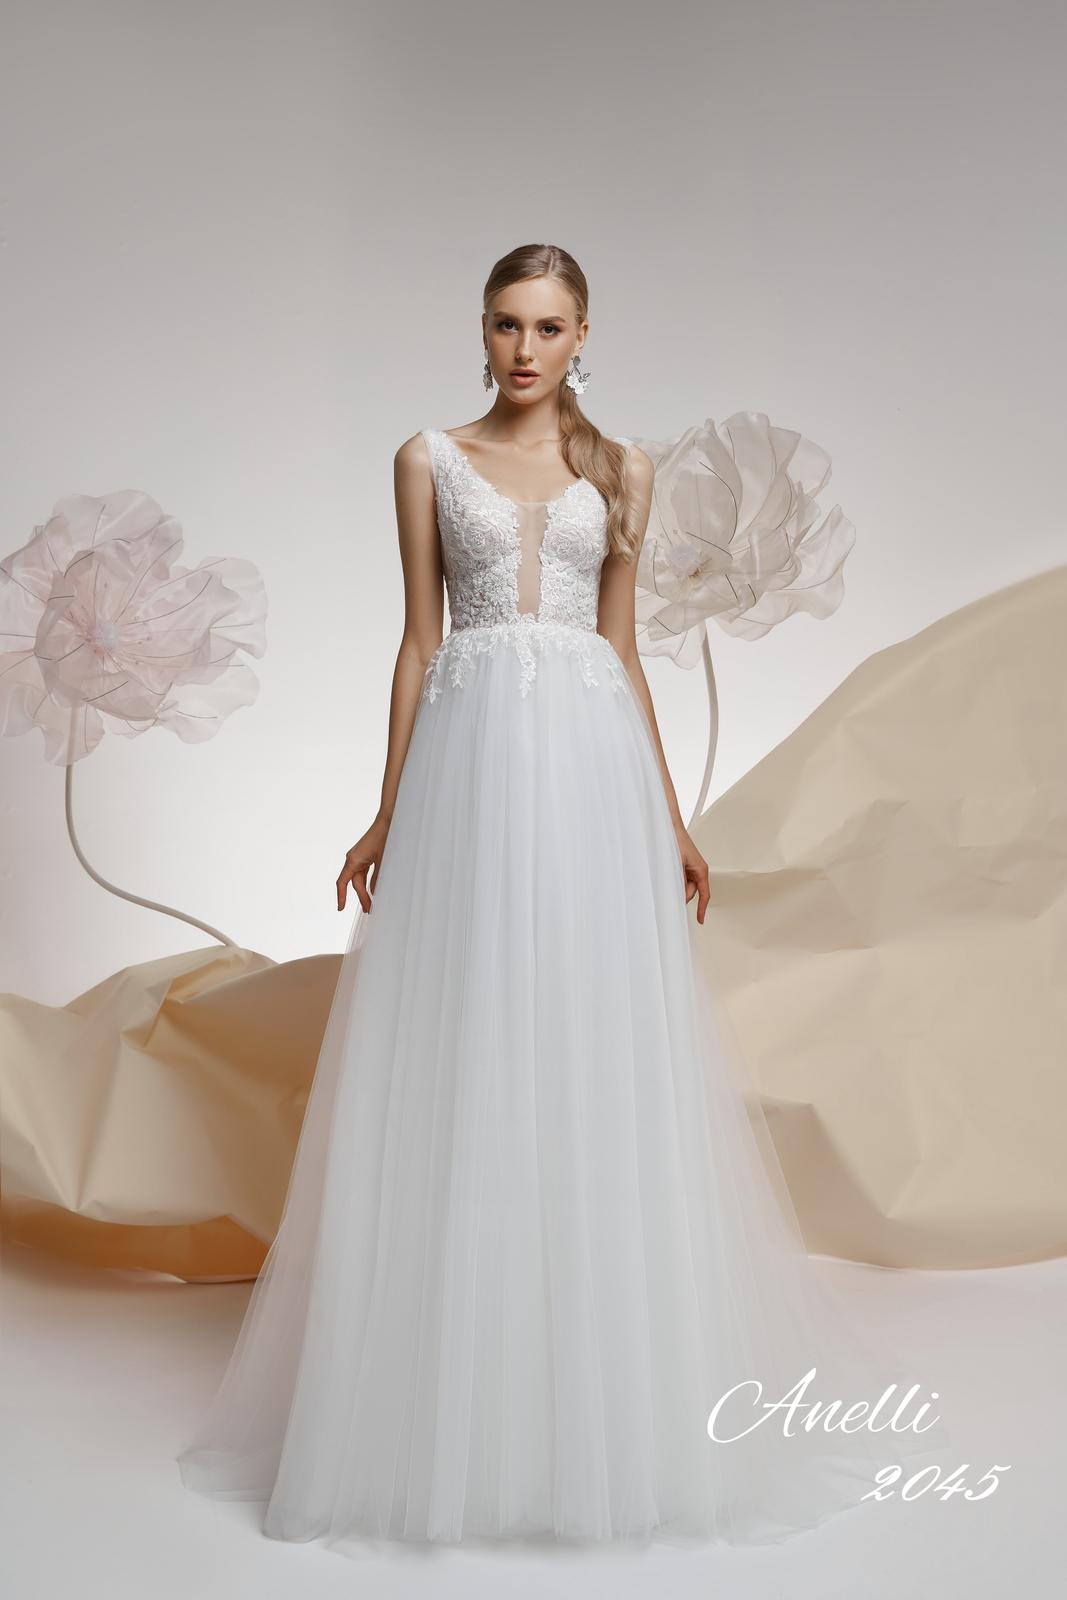 Svadobné šaty - Imagine 2045 - Obrázok č. 1